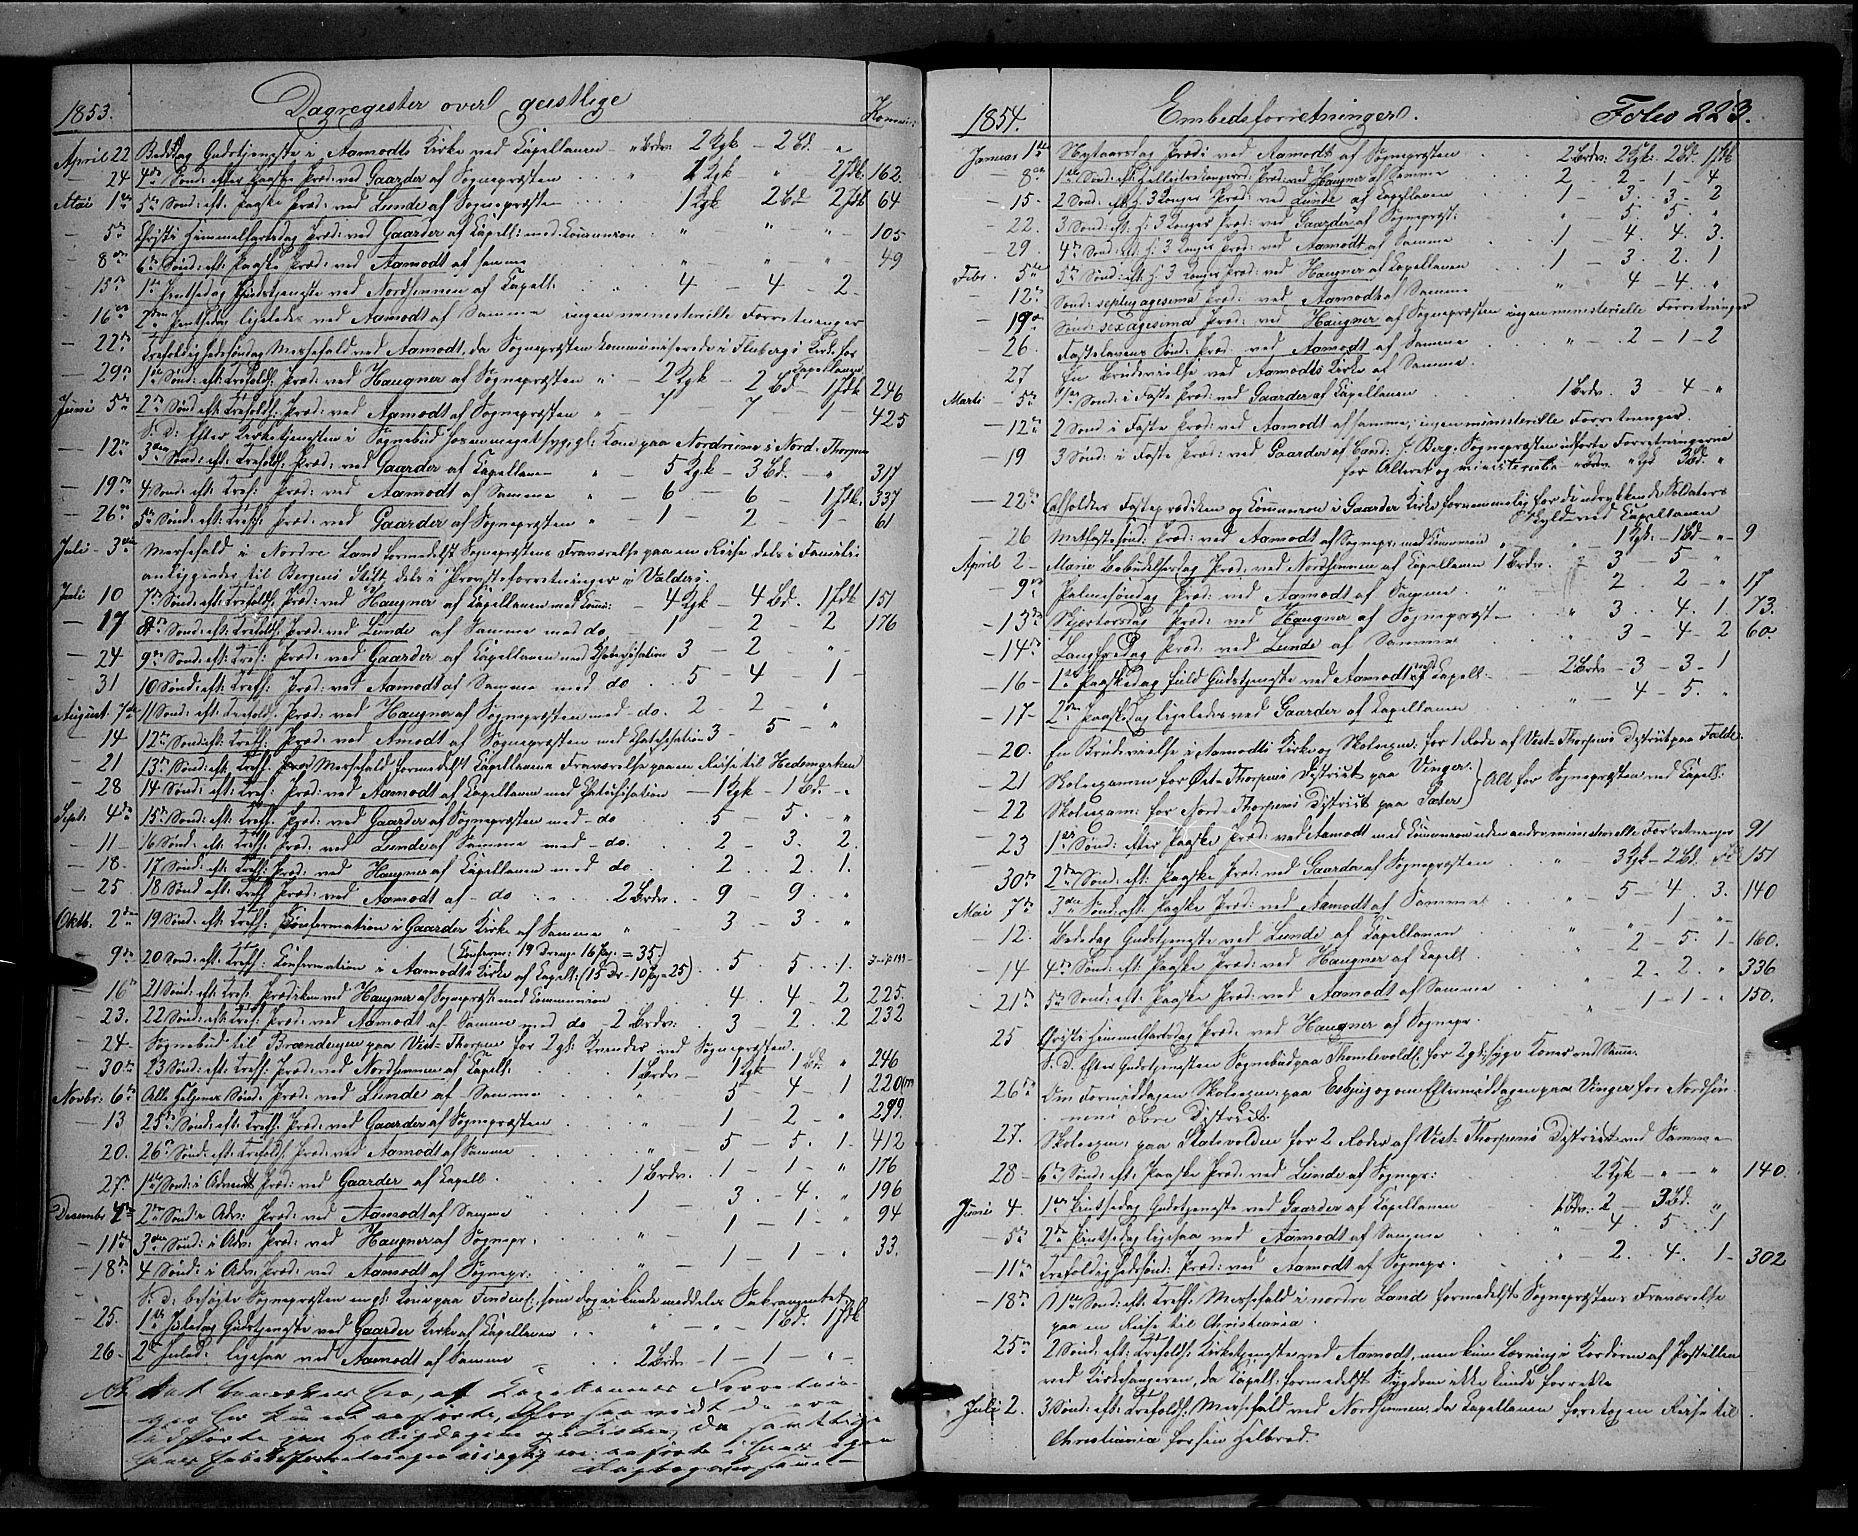 SAH, Land prestekontor, Ministerialbok nr. 10, 1847-1859, s. 223